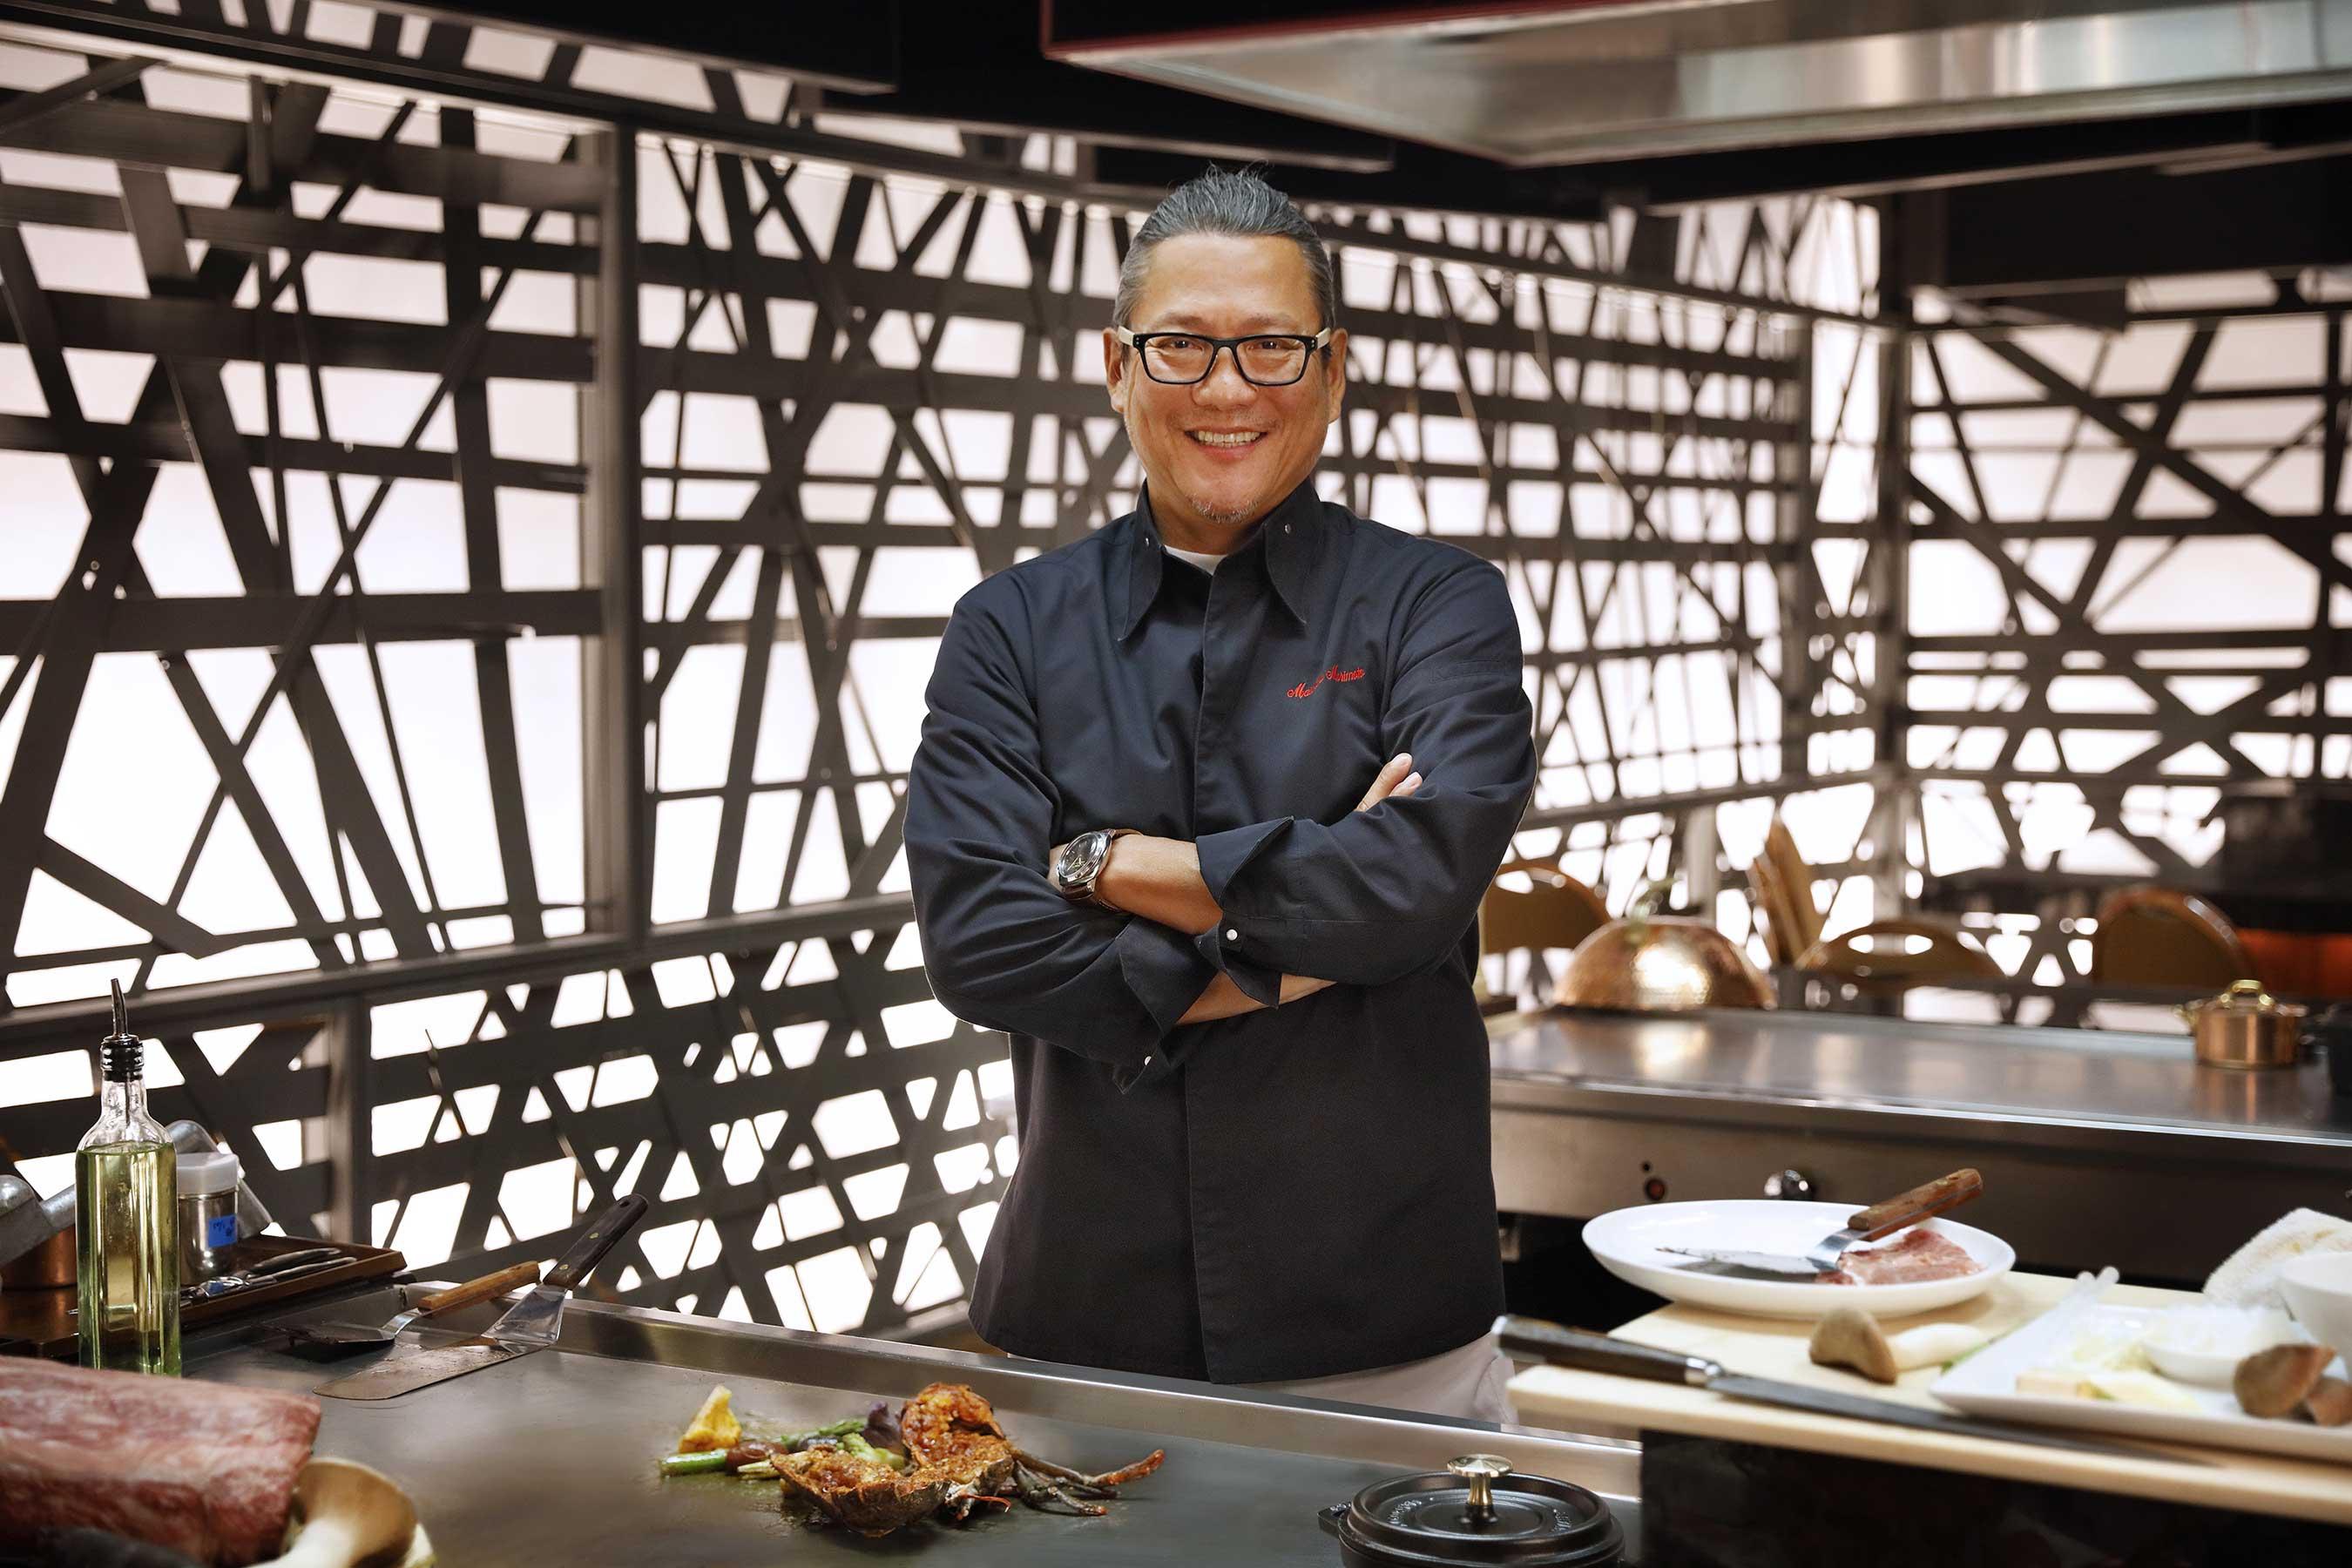 Chef Morimoto brings showmanship to Morimoto Las Vegas with his first Teppan table experience.